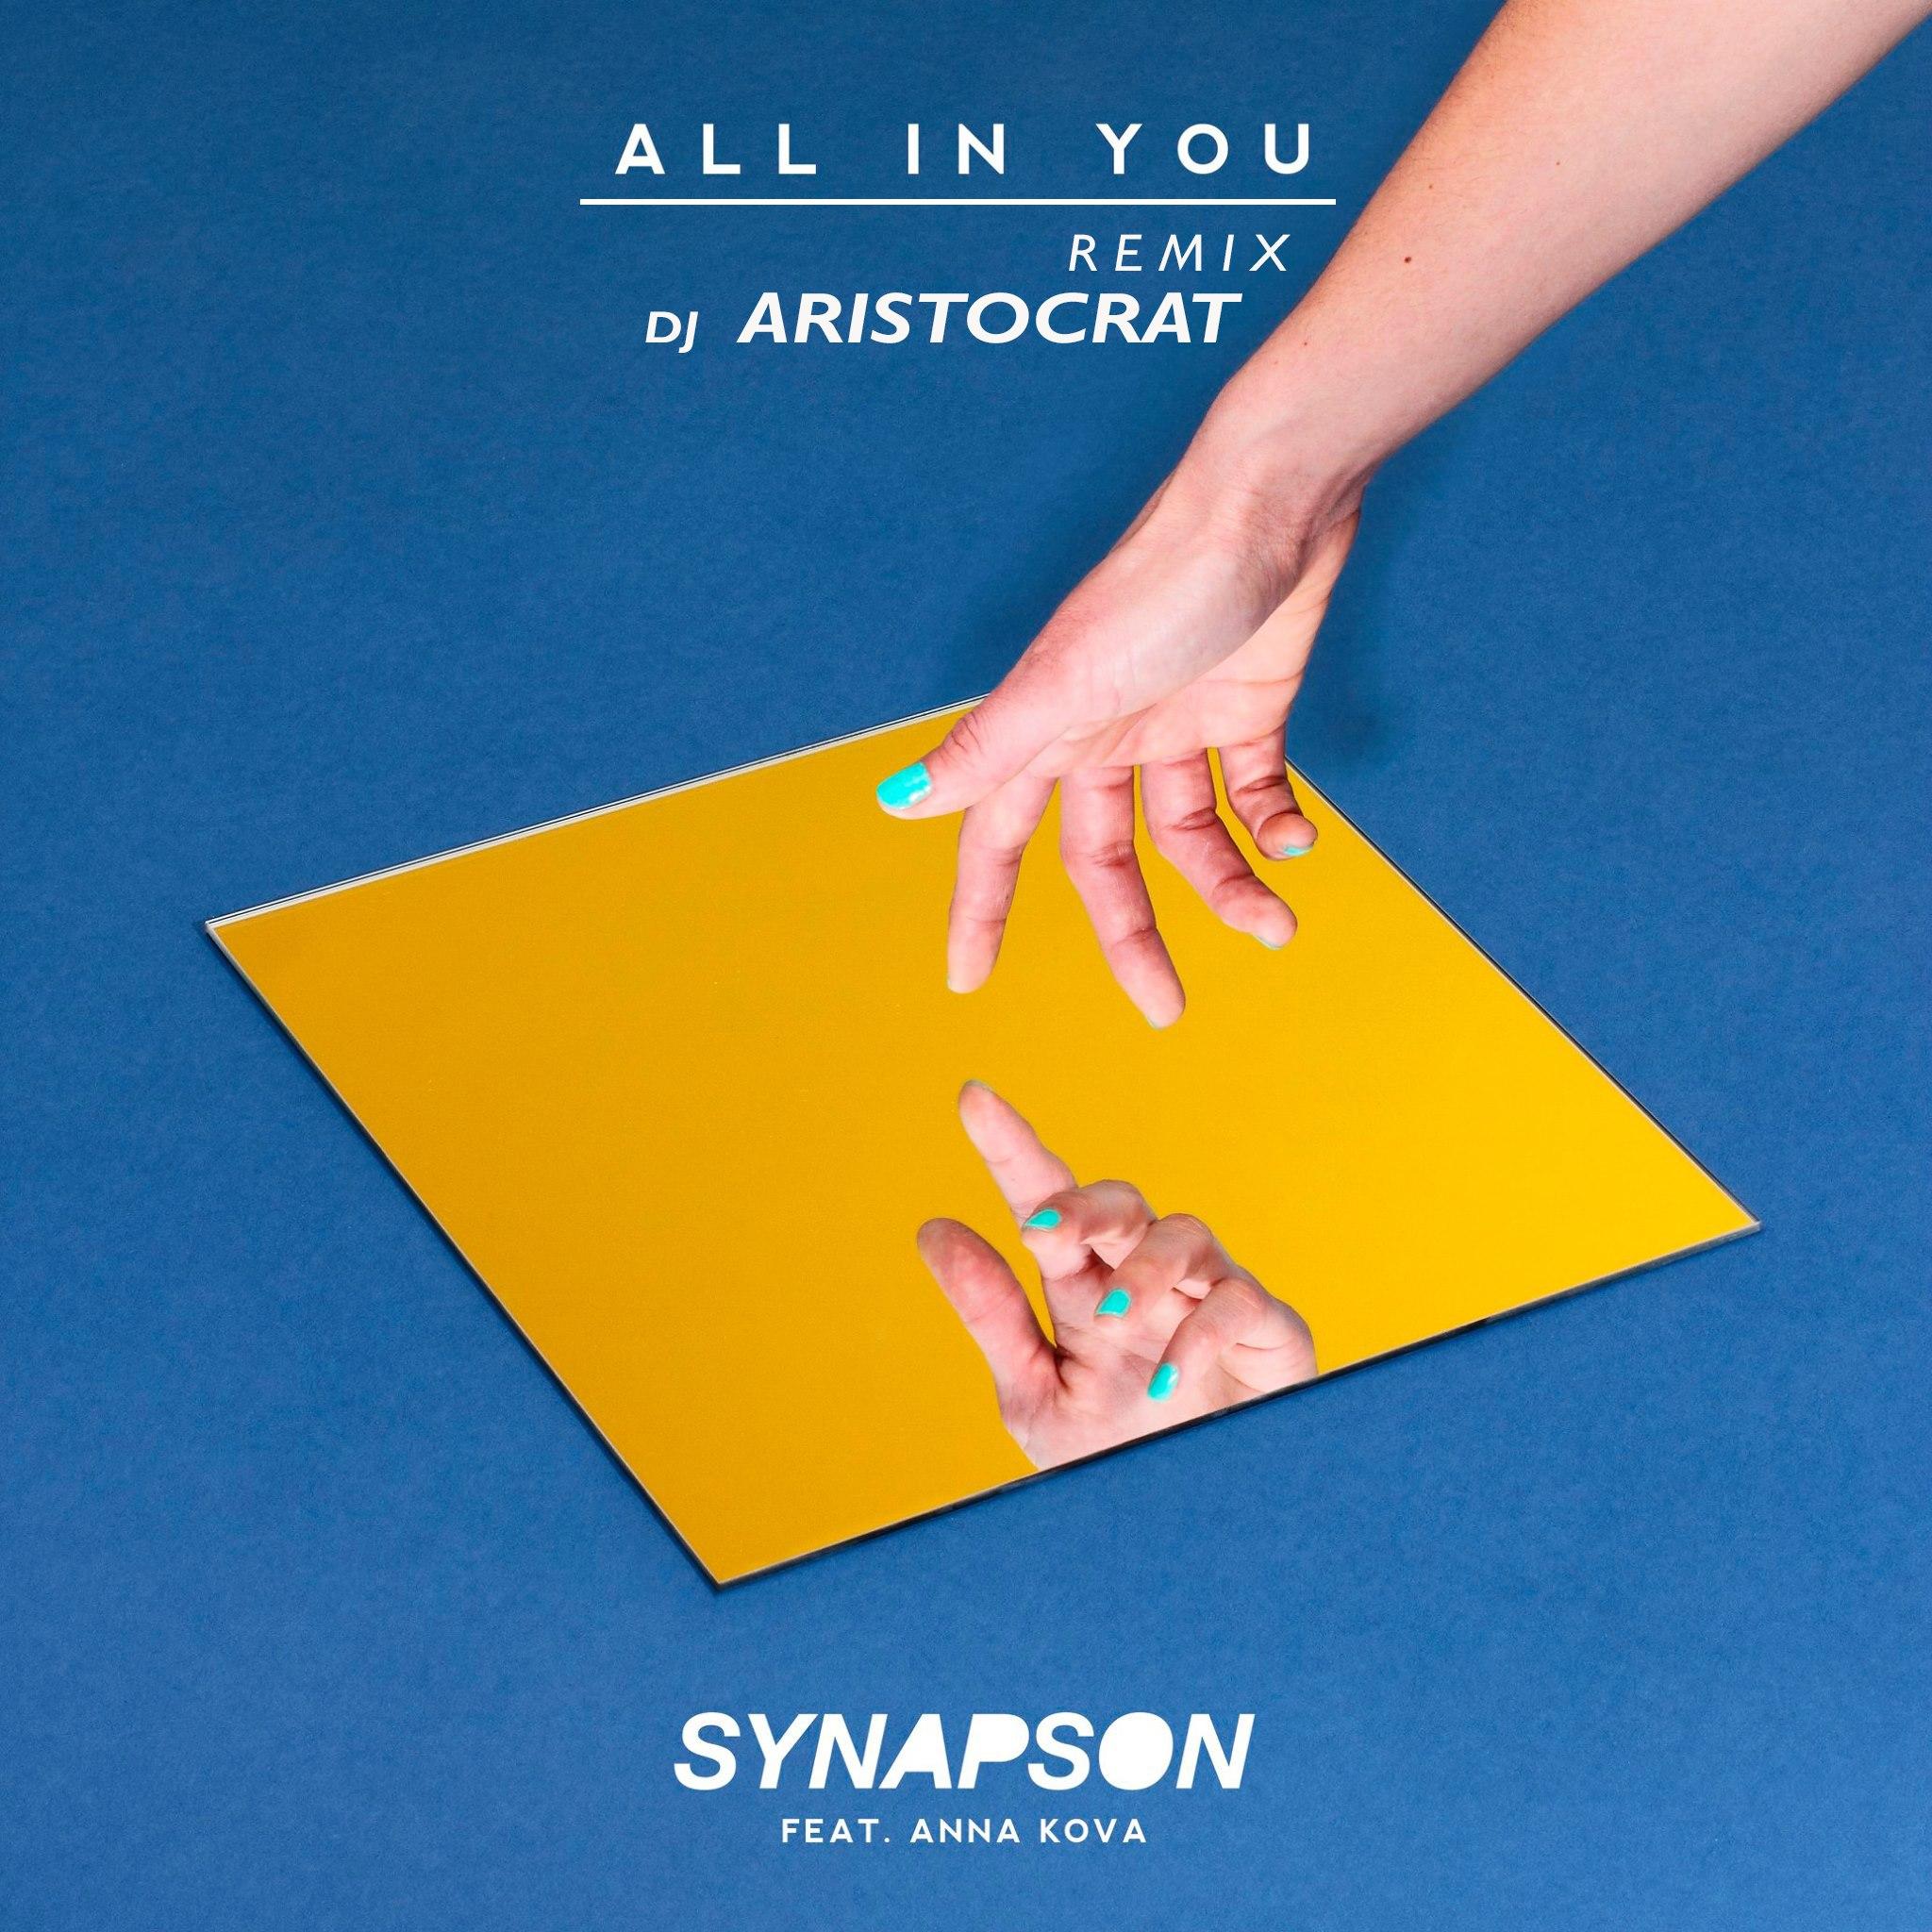 Synapson feat. Anna Kova - All In You (DJ Aristocrat Radio RMX).jpg